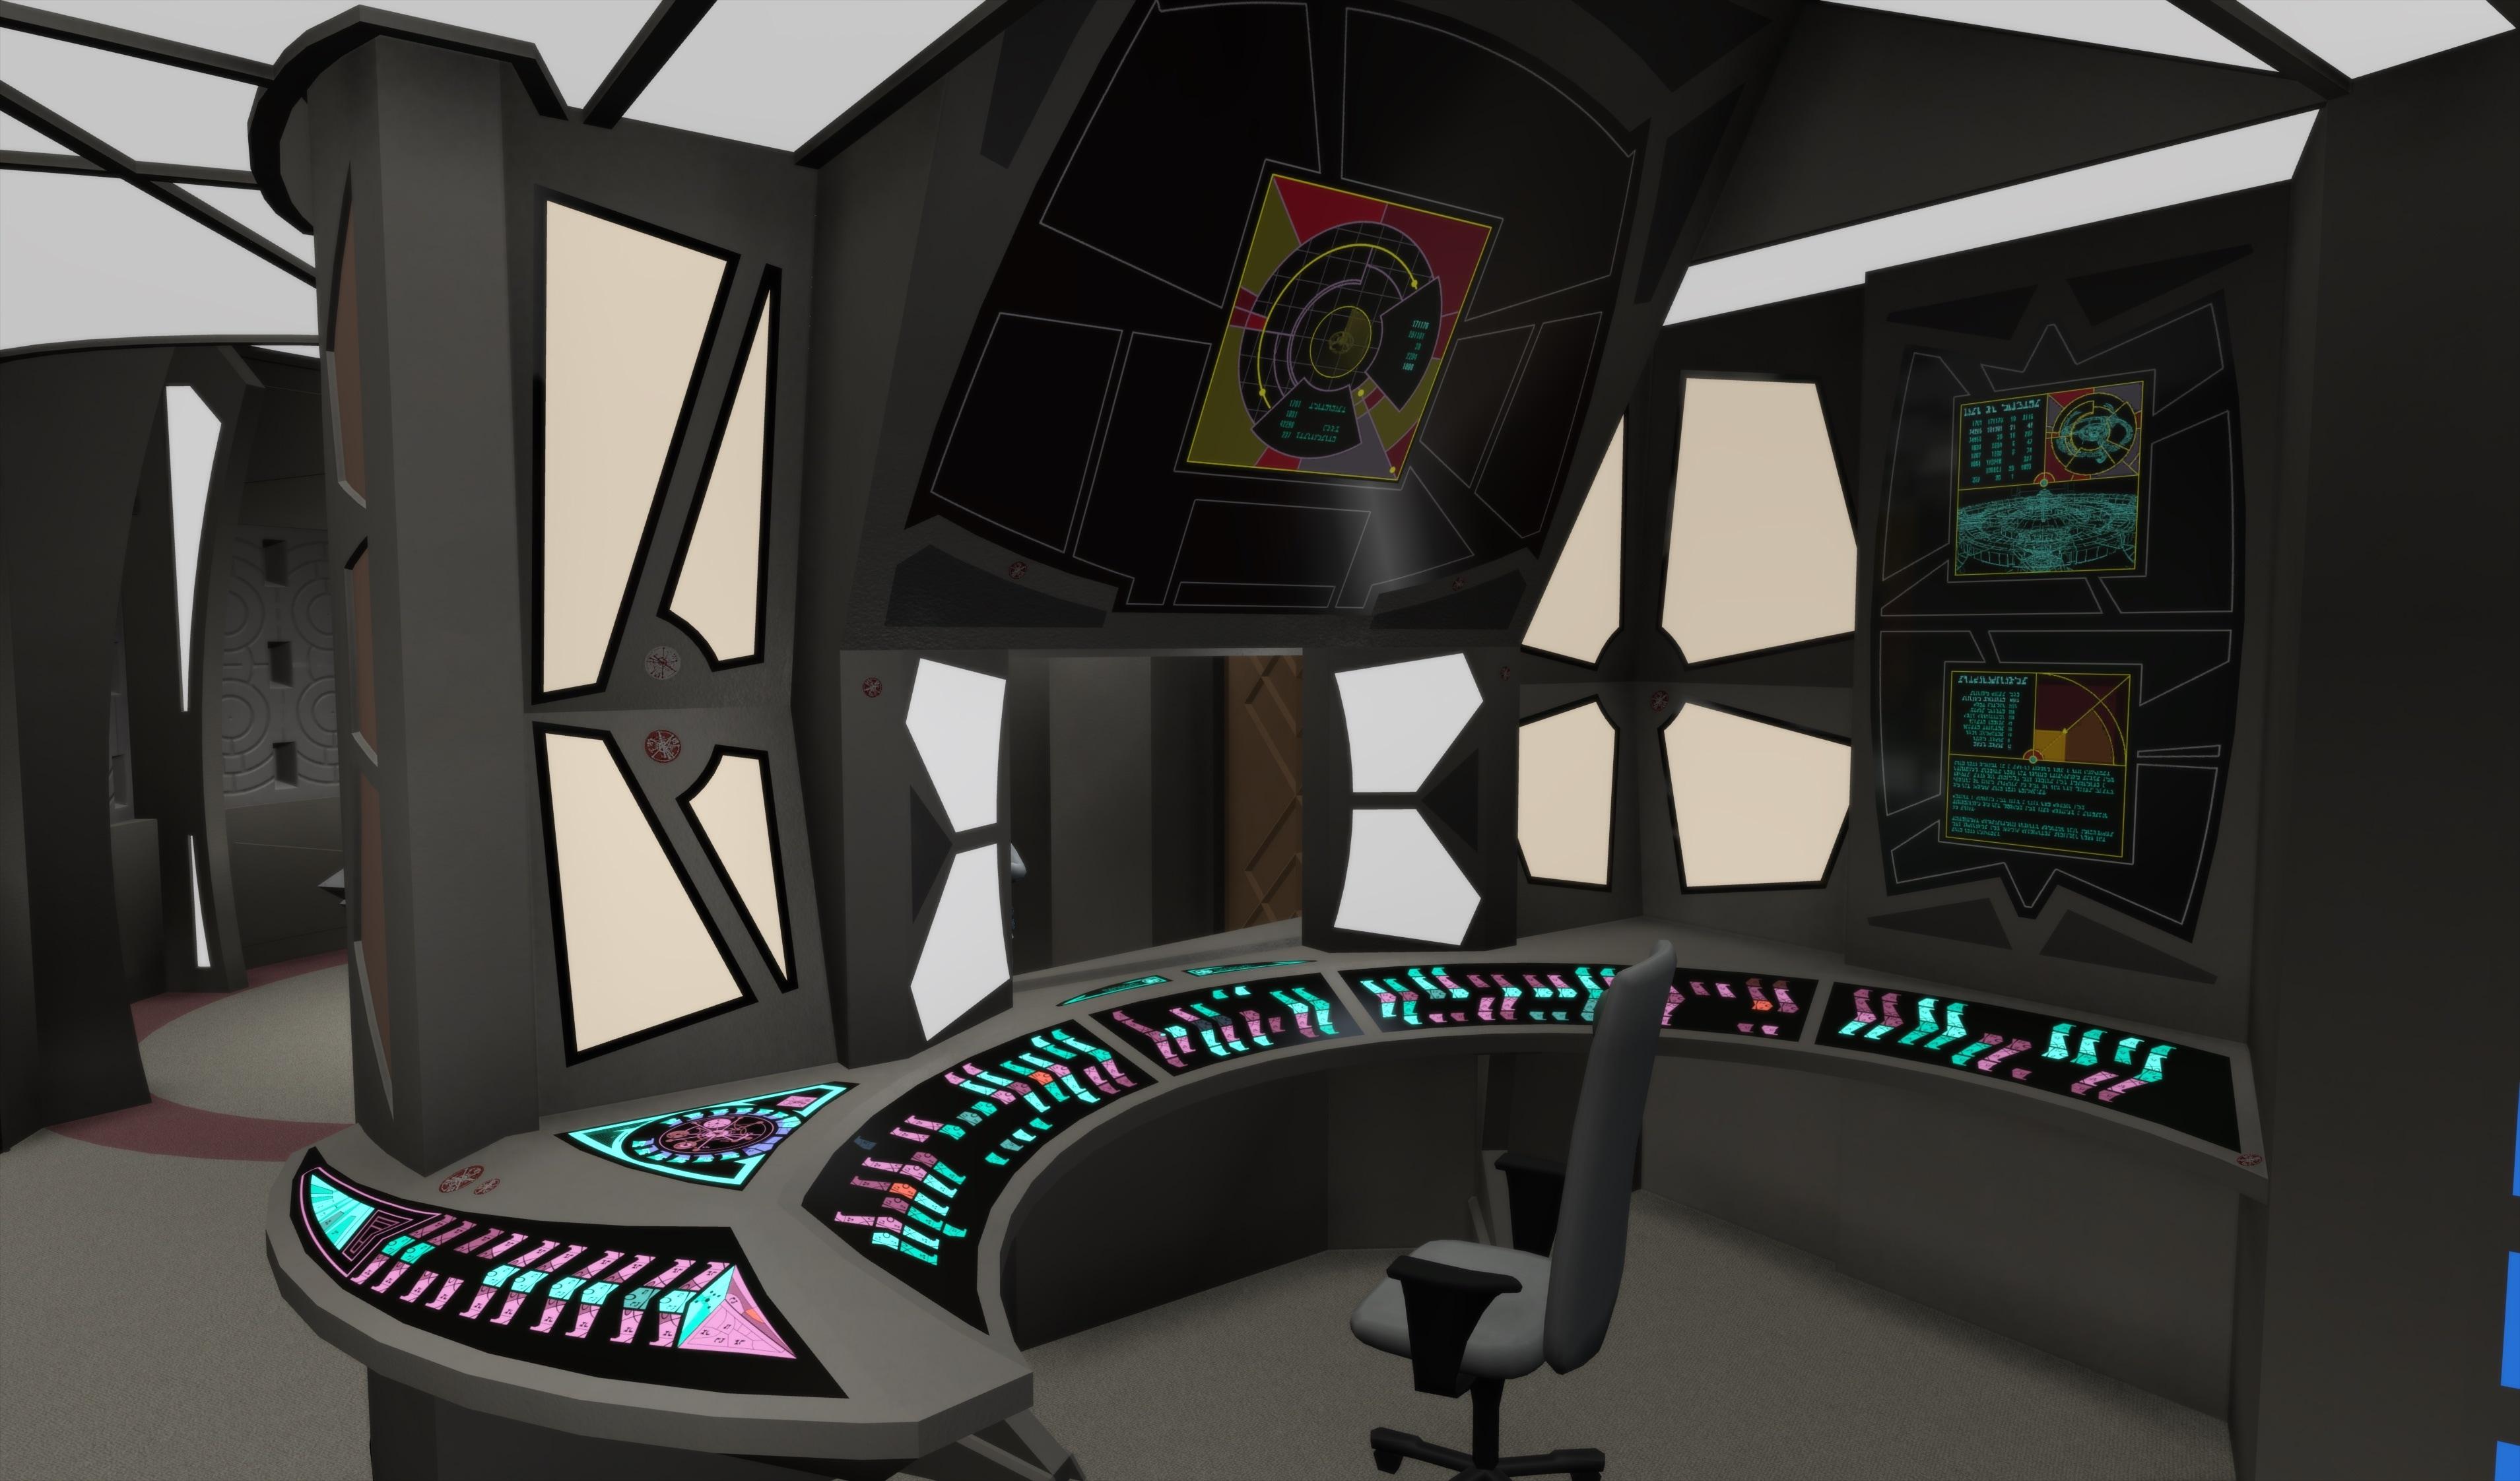 Deep Space Nine Gets a Total Rebuild   Star Trek Online